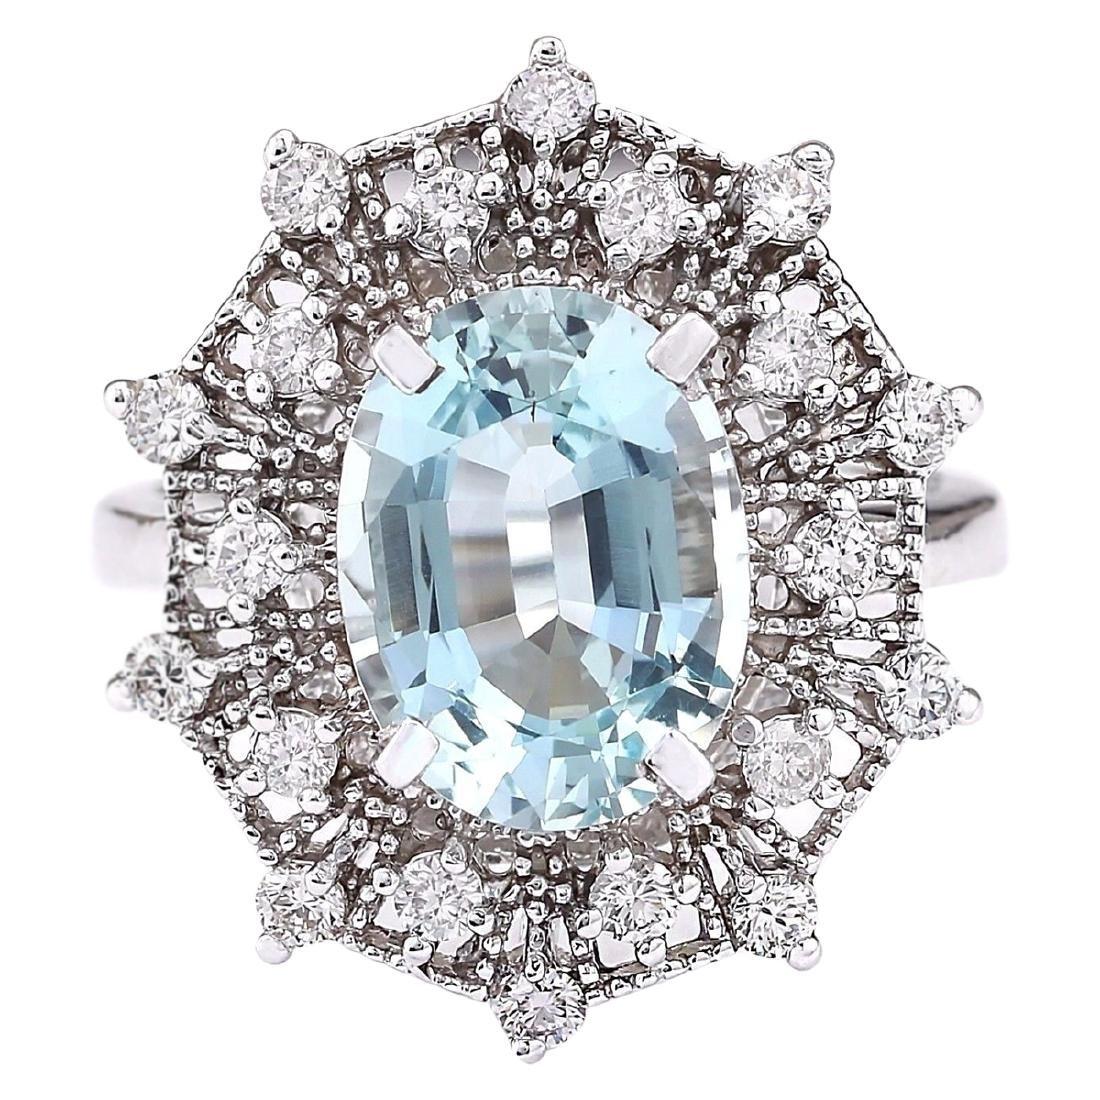 4.32 CTW Natural Aquamarine And Diamond Ring In 18K